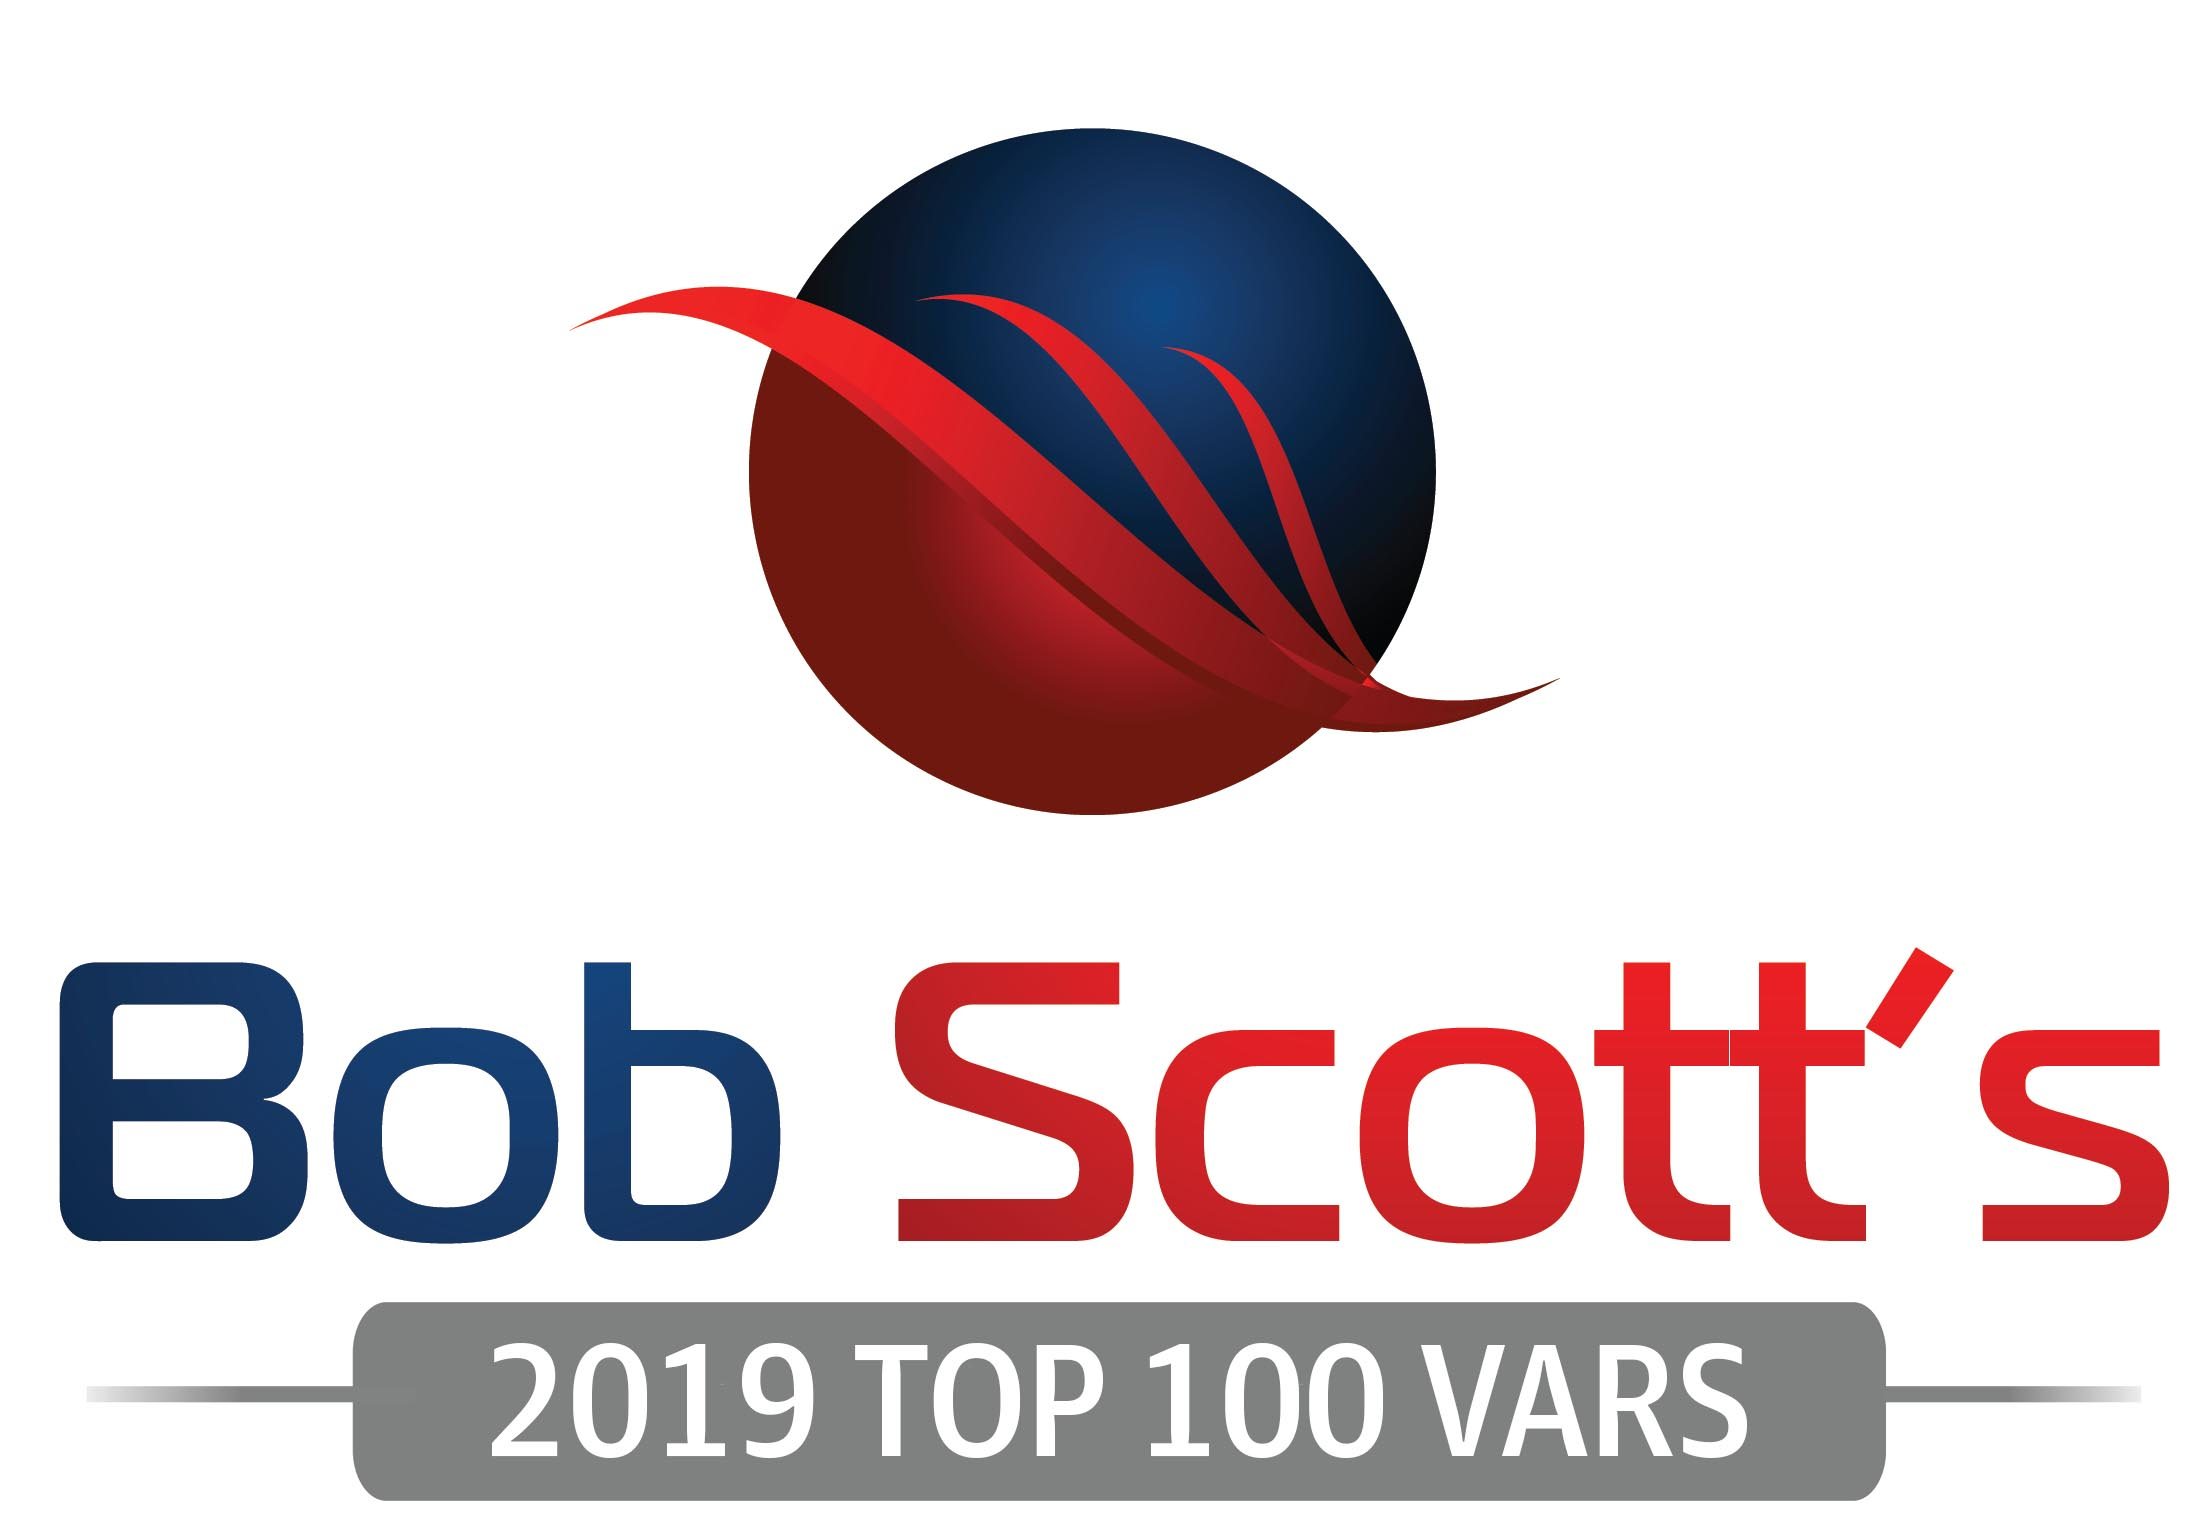 Top 100 VARs 2019 logo.jpg